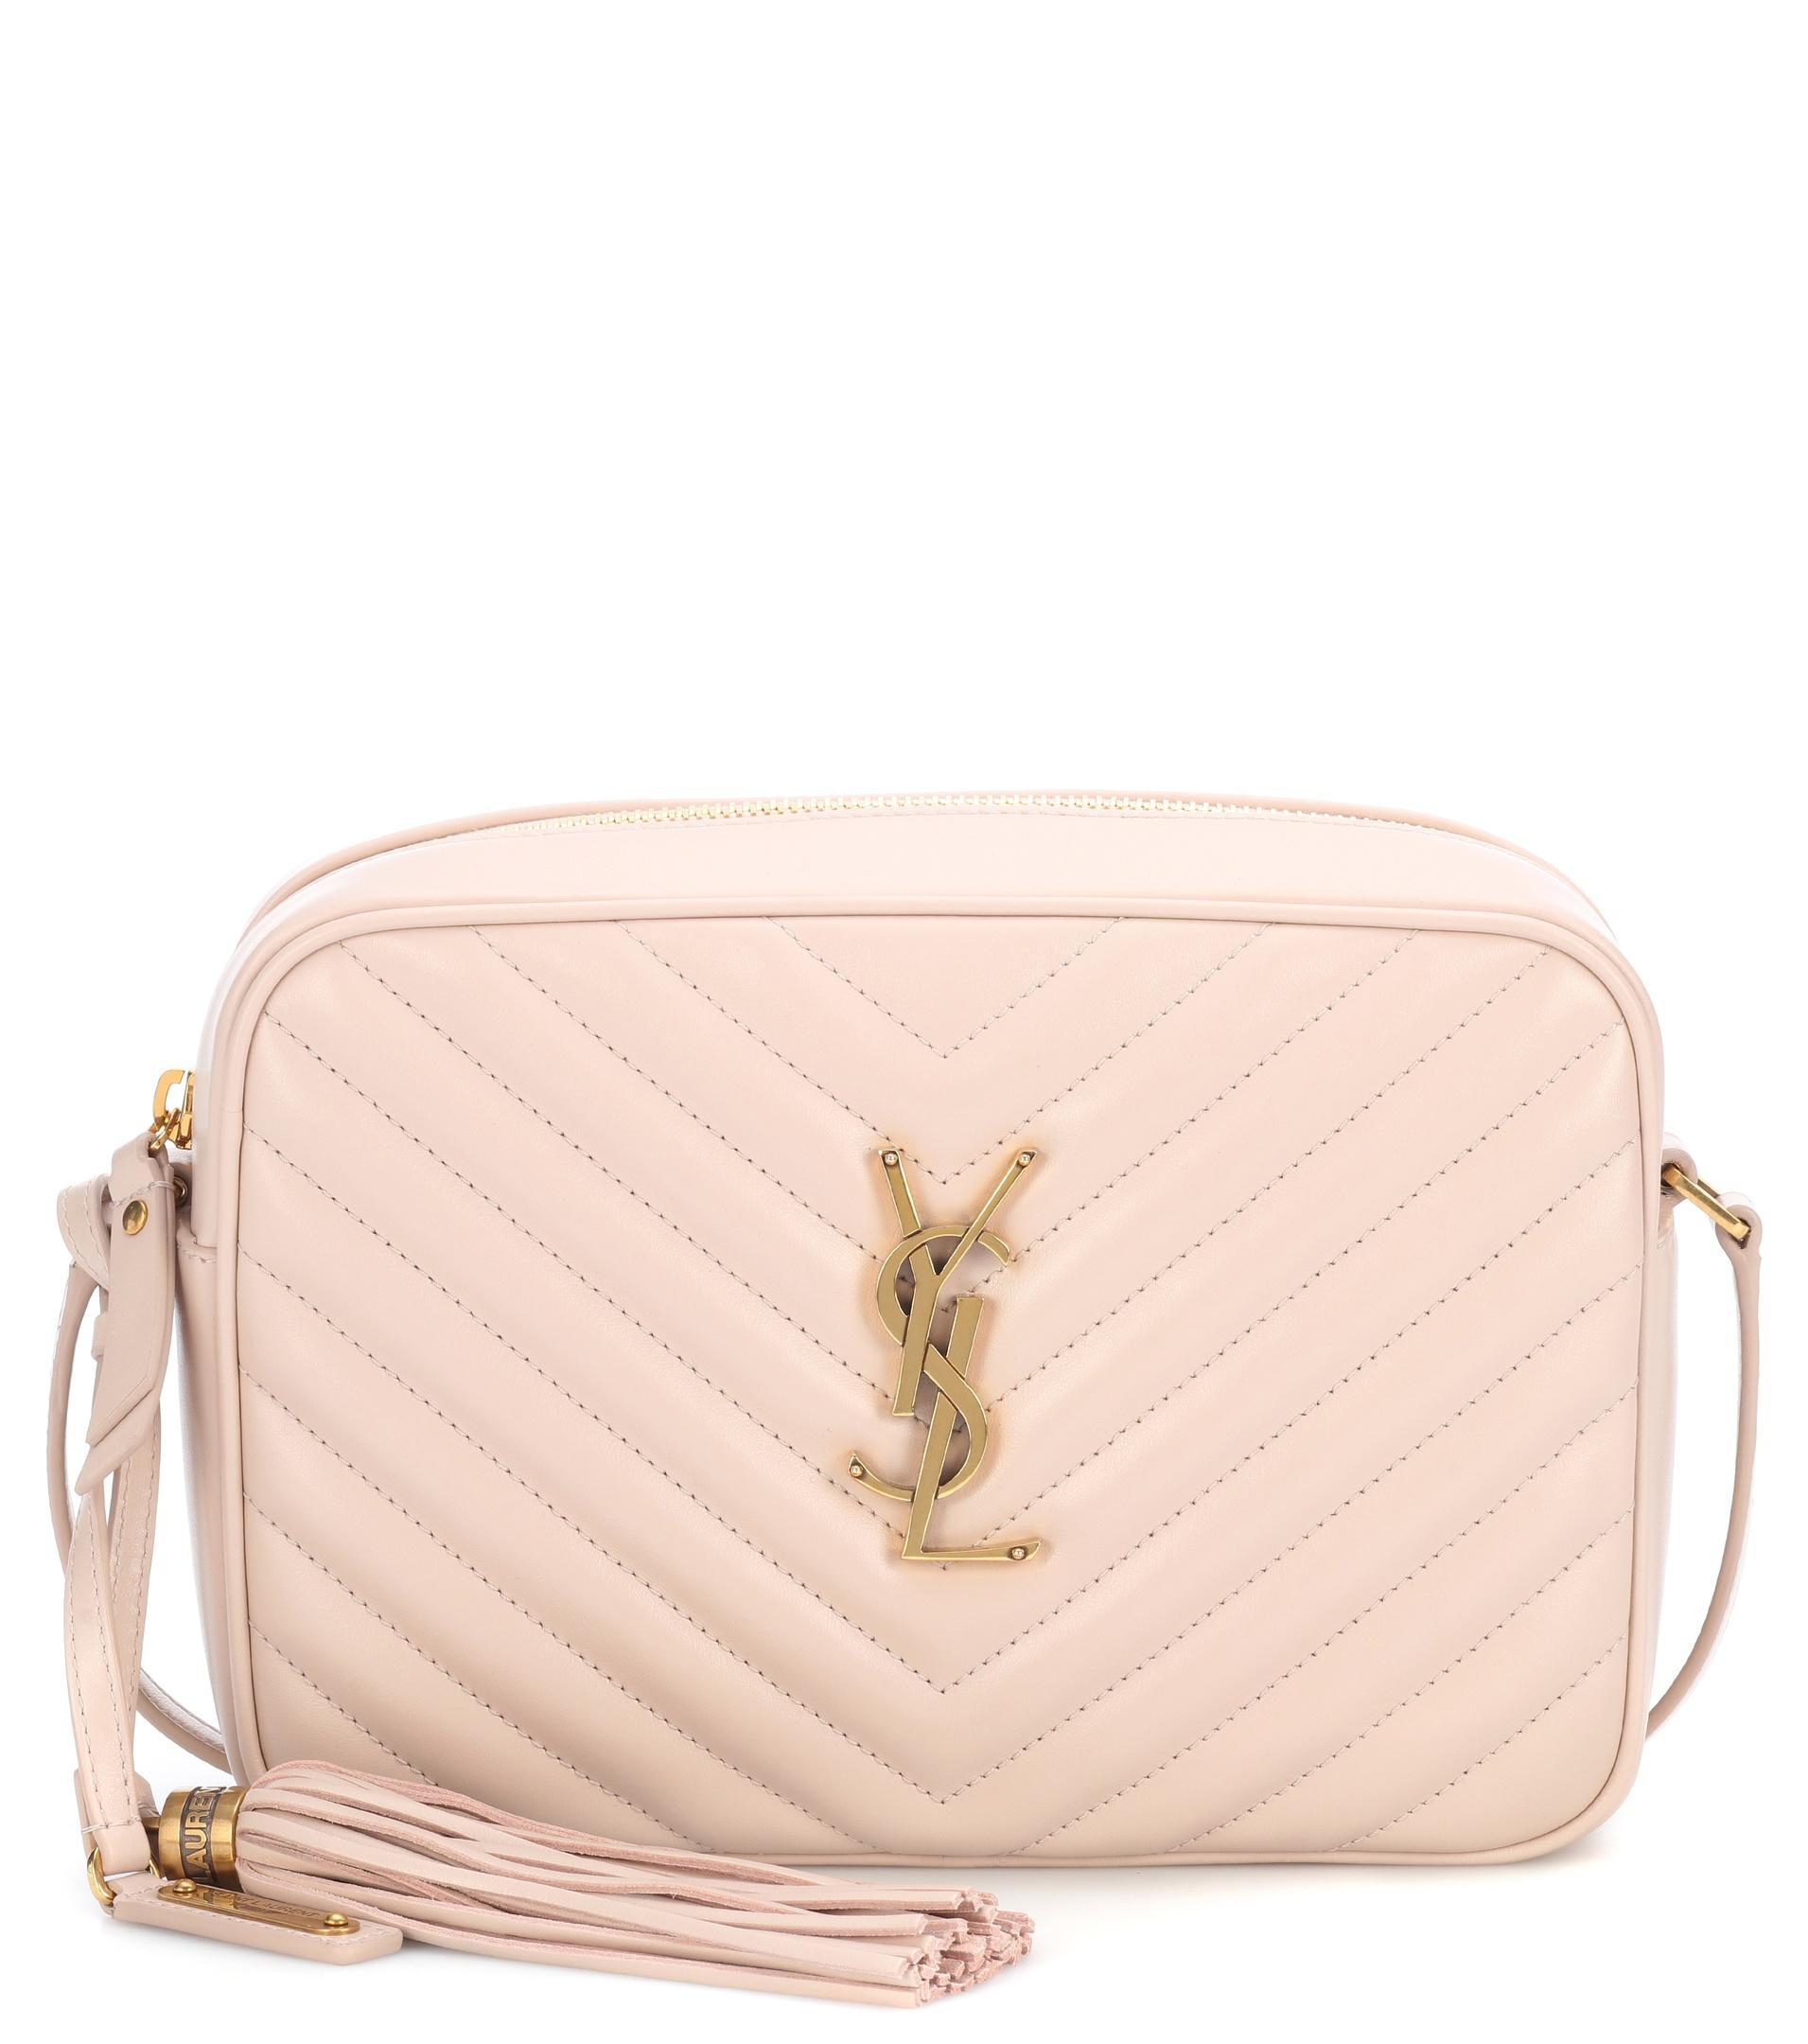 3f0794ad05b Saint Laurent Lou Leather Shoulder Bag in Pink - Lyst